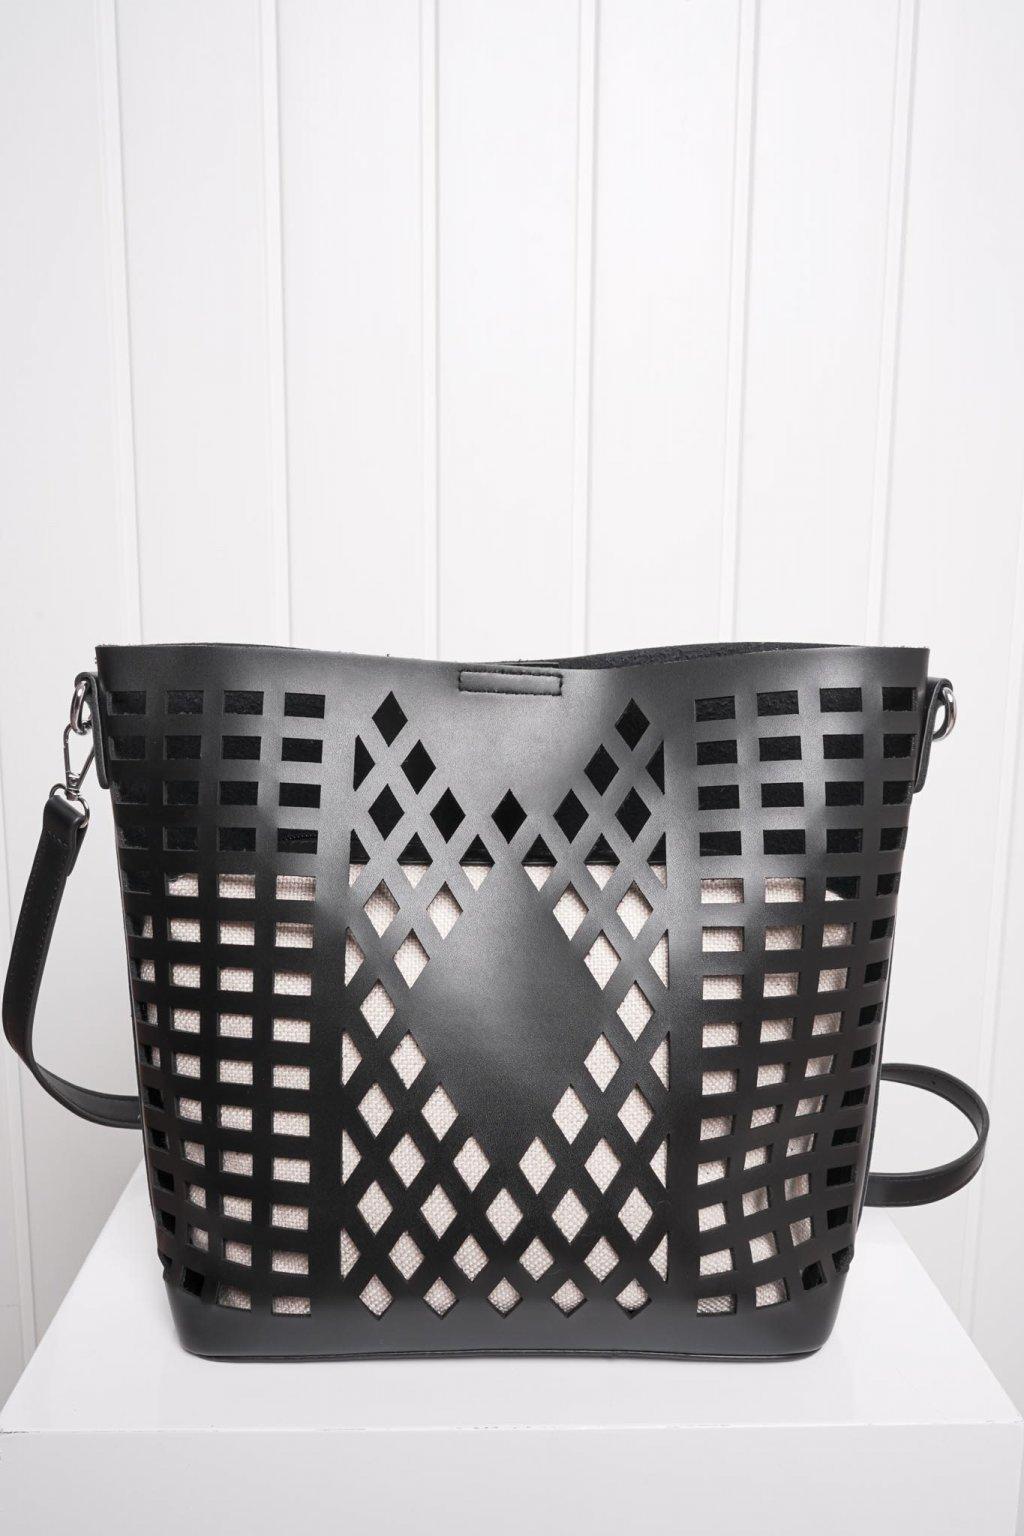 Kabelka, ruksak, dobrá cena, čierna kabelka, čierny ruksak, basic, kabelky, ruksaky 090